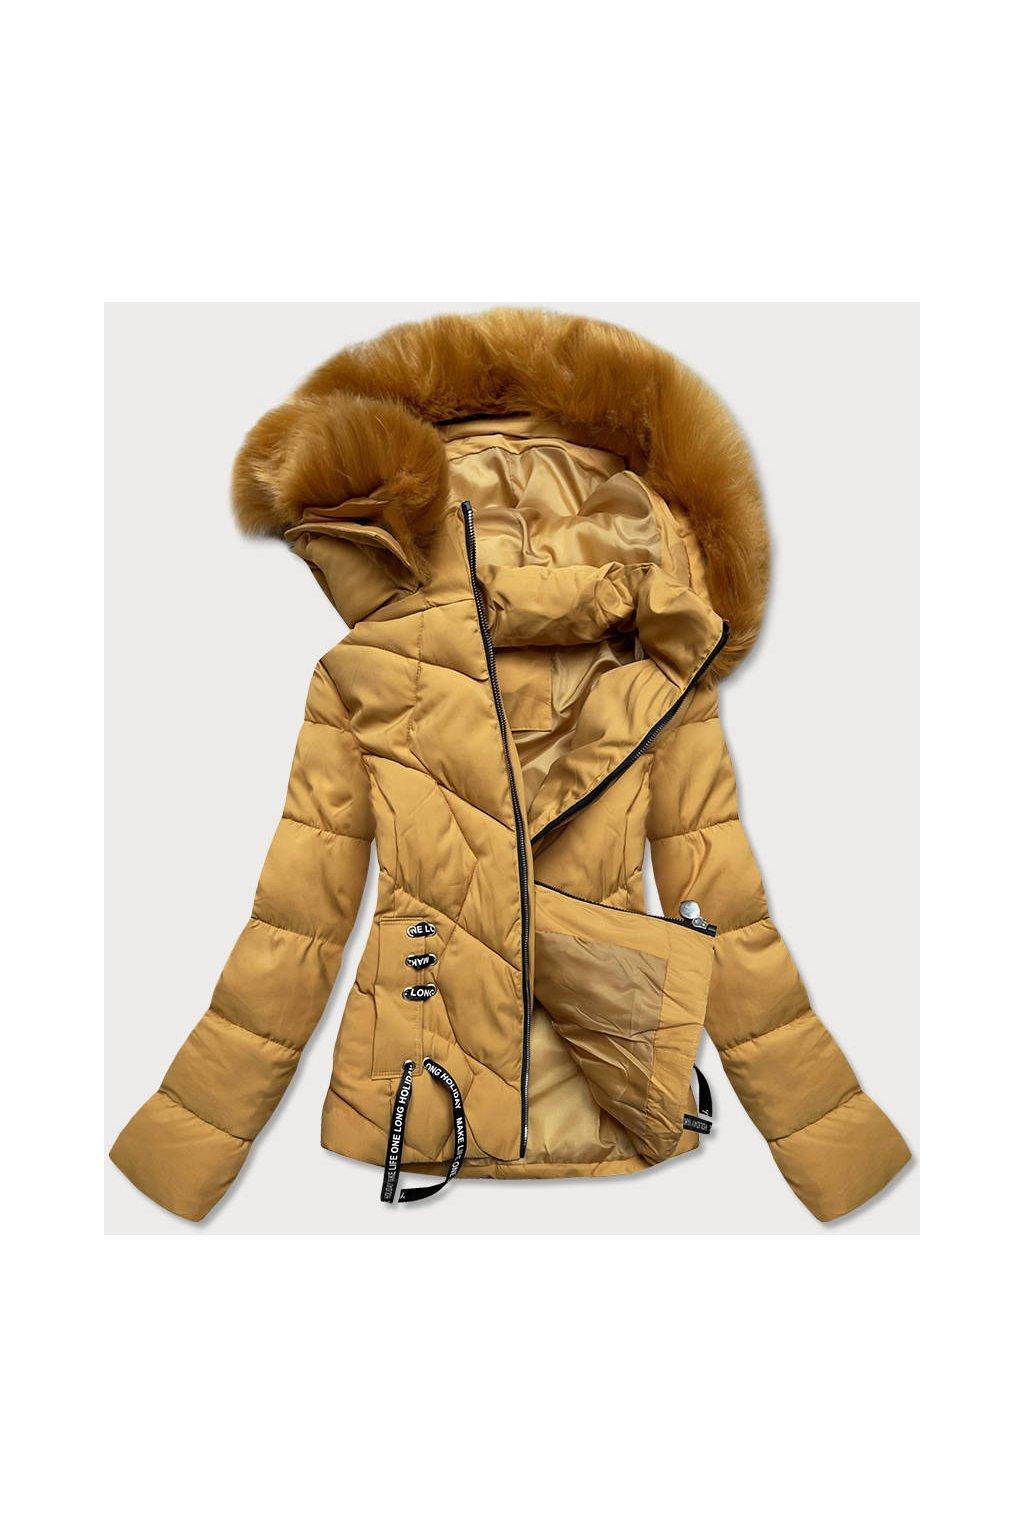 Dámska zimná bunda s kapucňou H1021-80 žltá